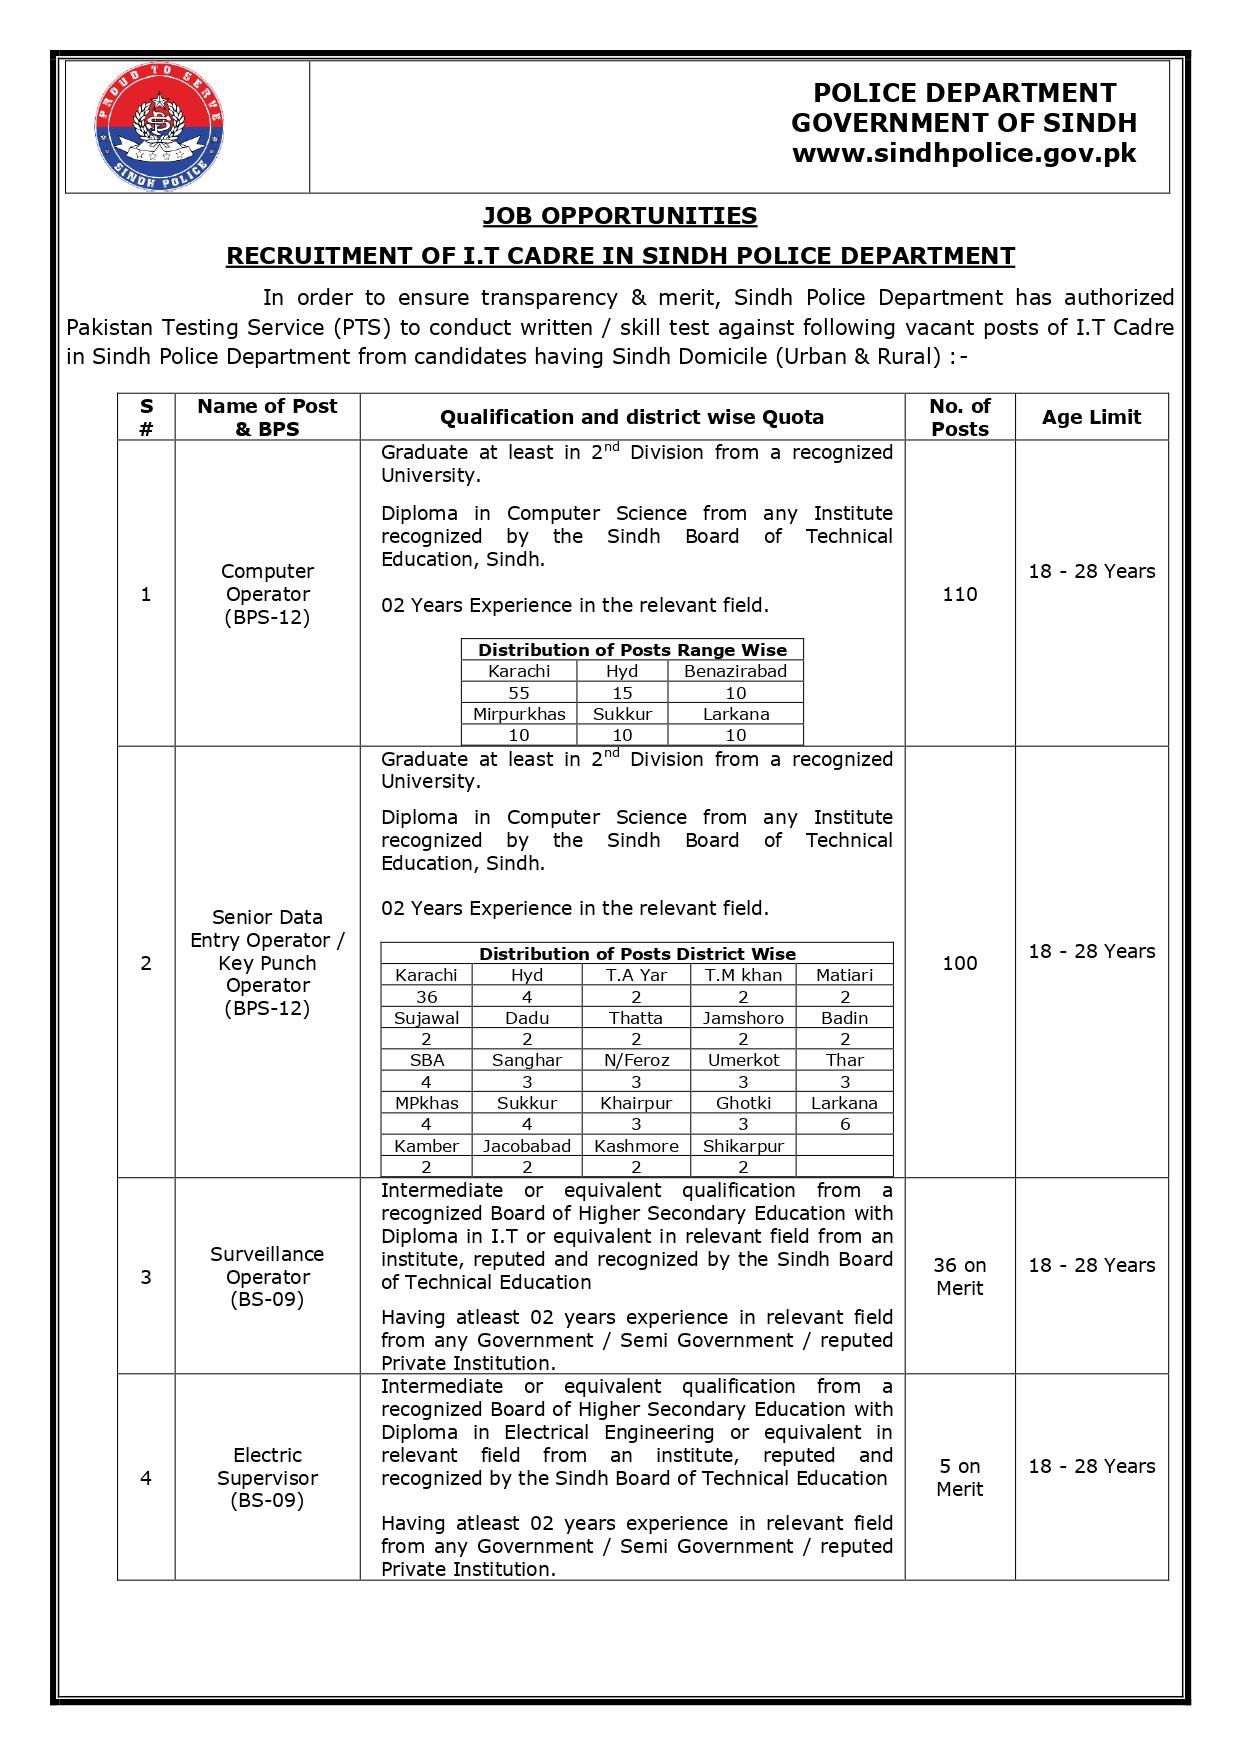 Sindh Police Department PTS Jobs 2019 Test Preparation online